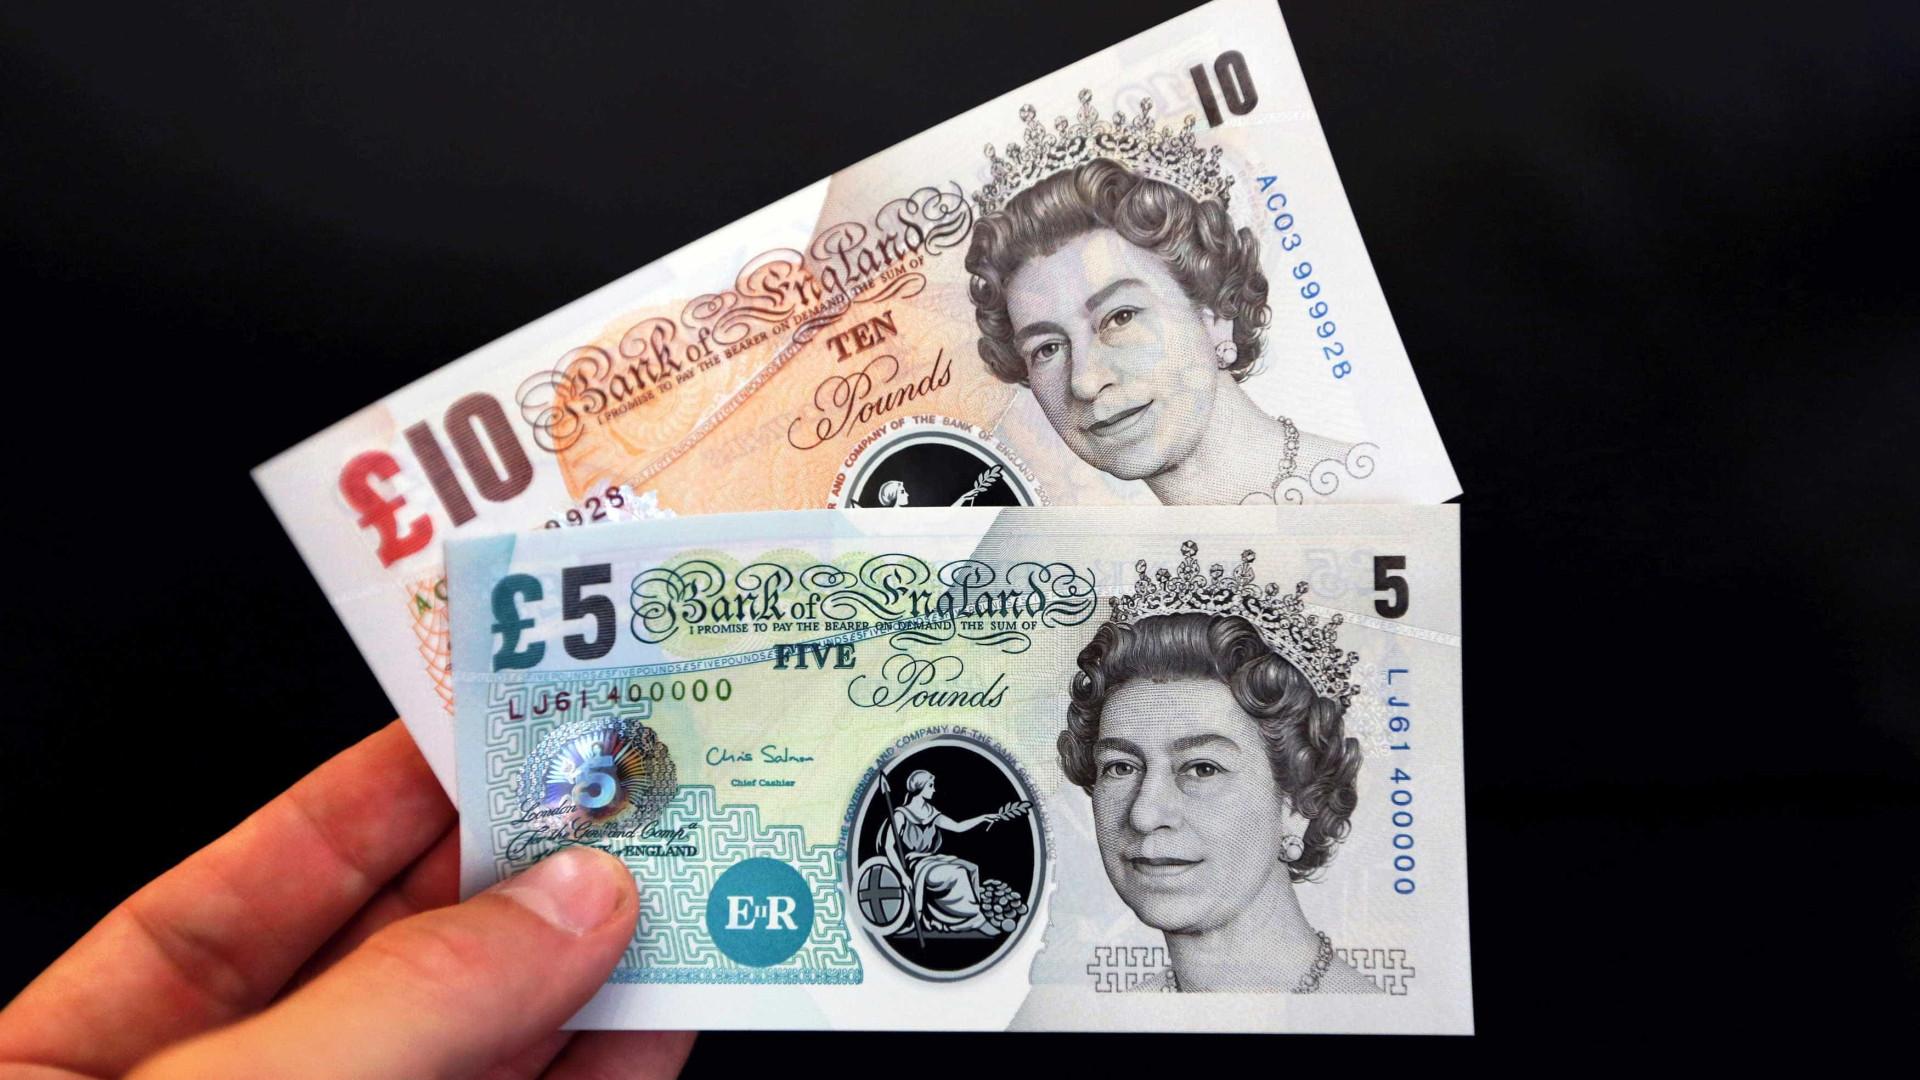 Templos hindu no Reino Unido poderão proibir entrada de notas de 5 libras